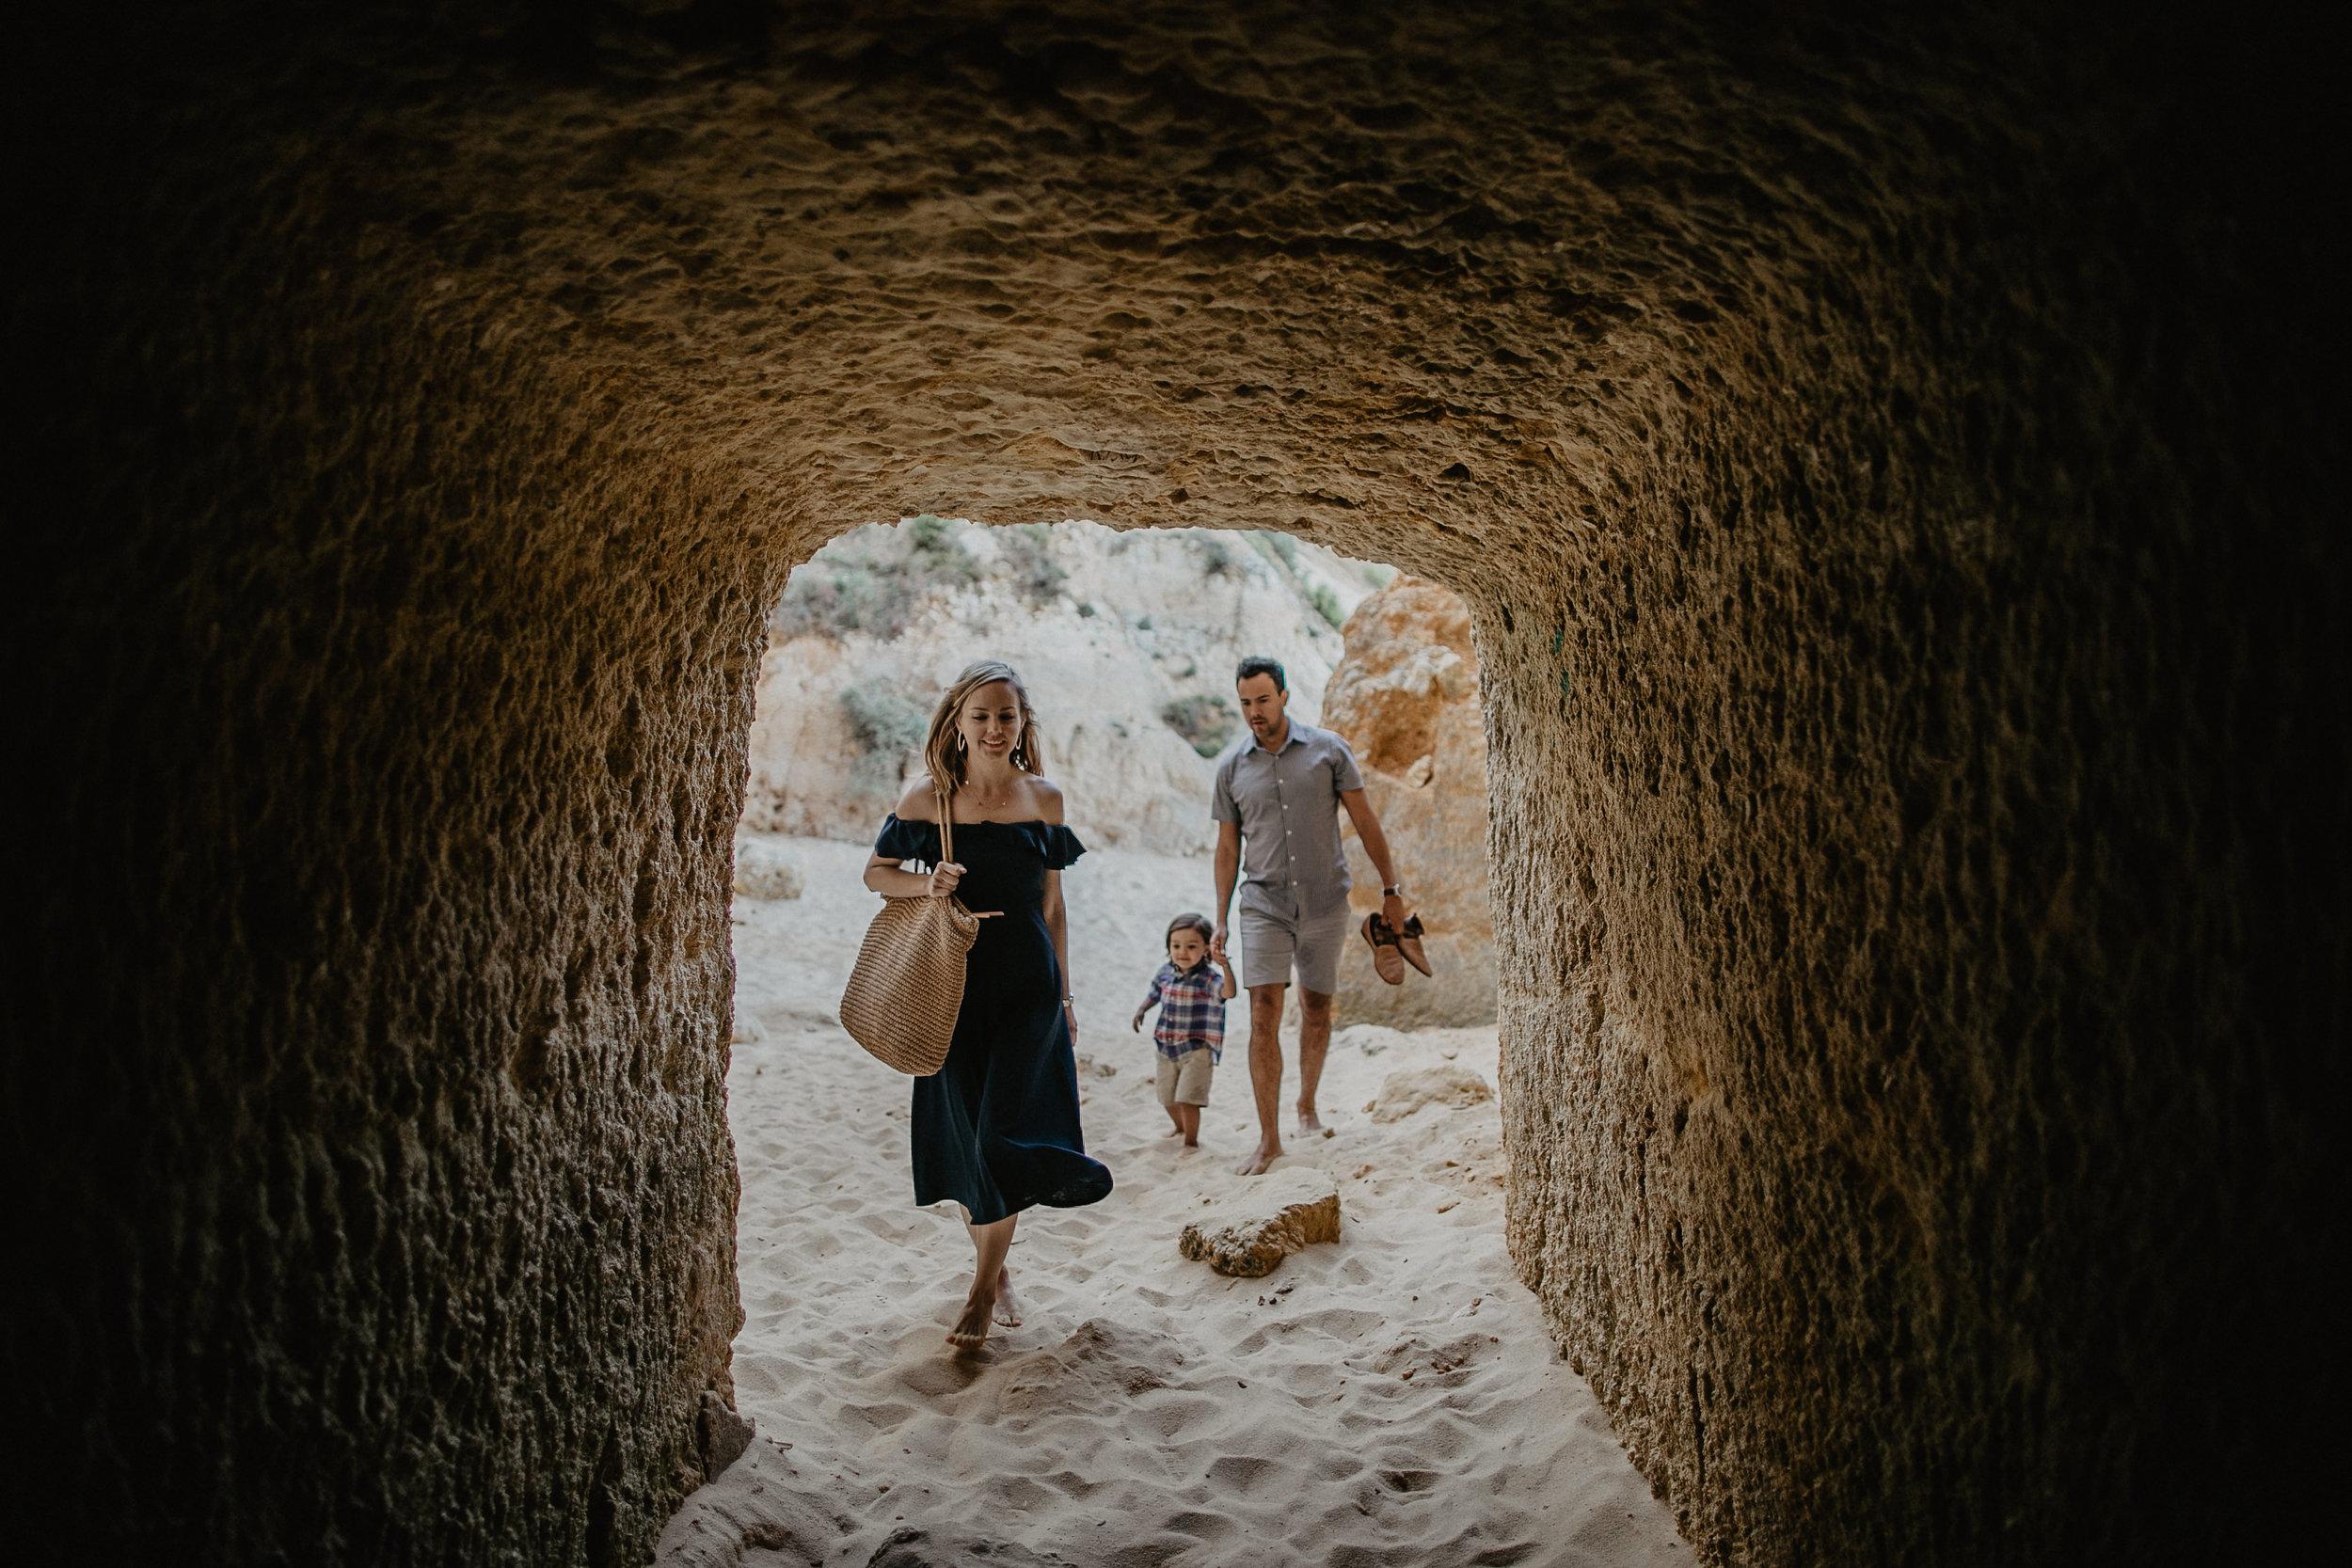 Lapela-Family-photography-Lagos-Algarve46.jpg